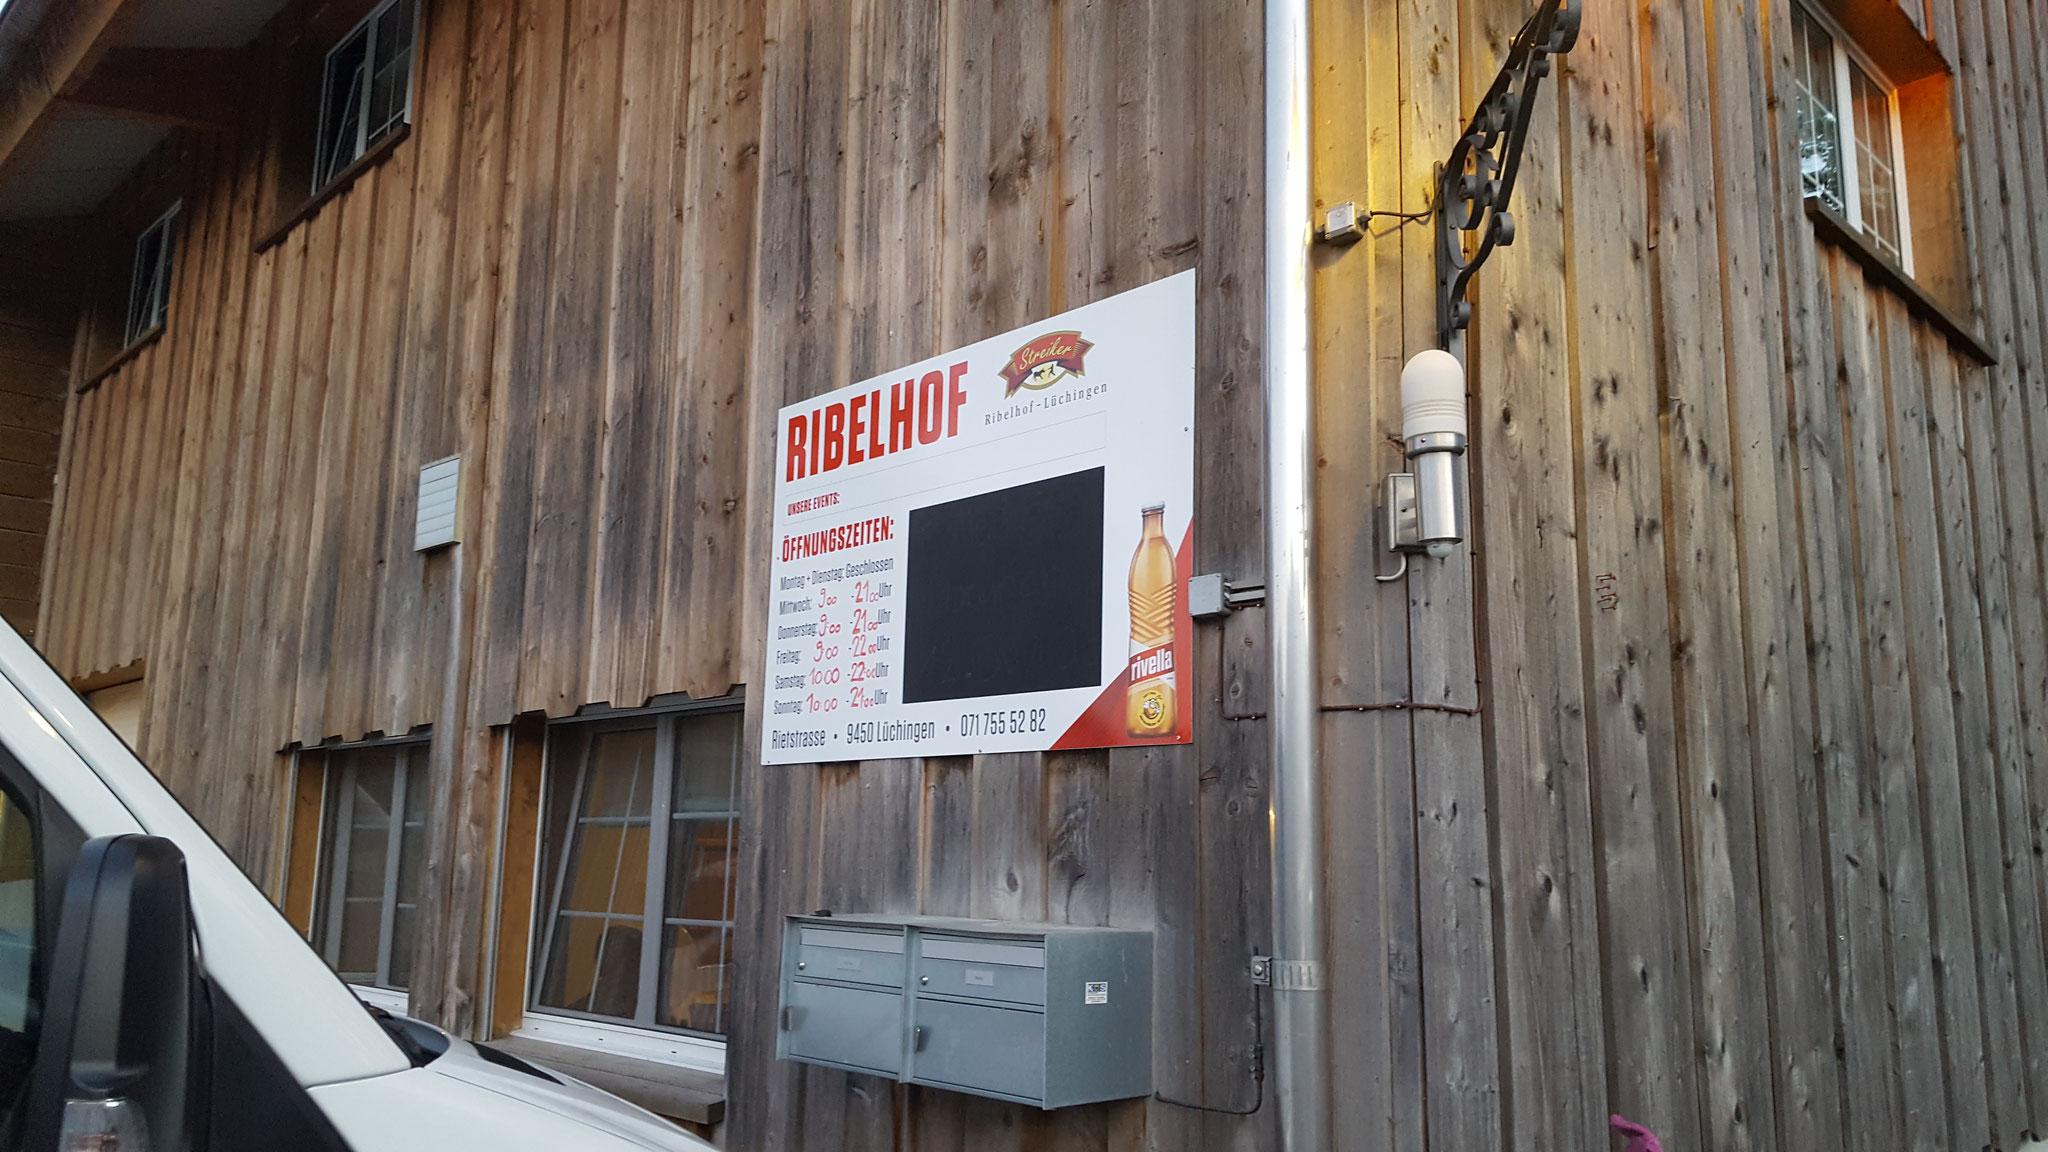 Nachtessen im Ribelhof in Altstätten